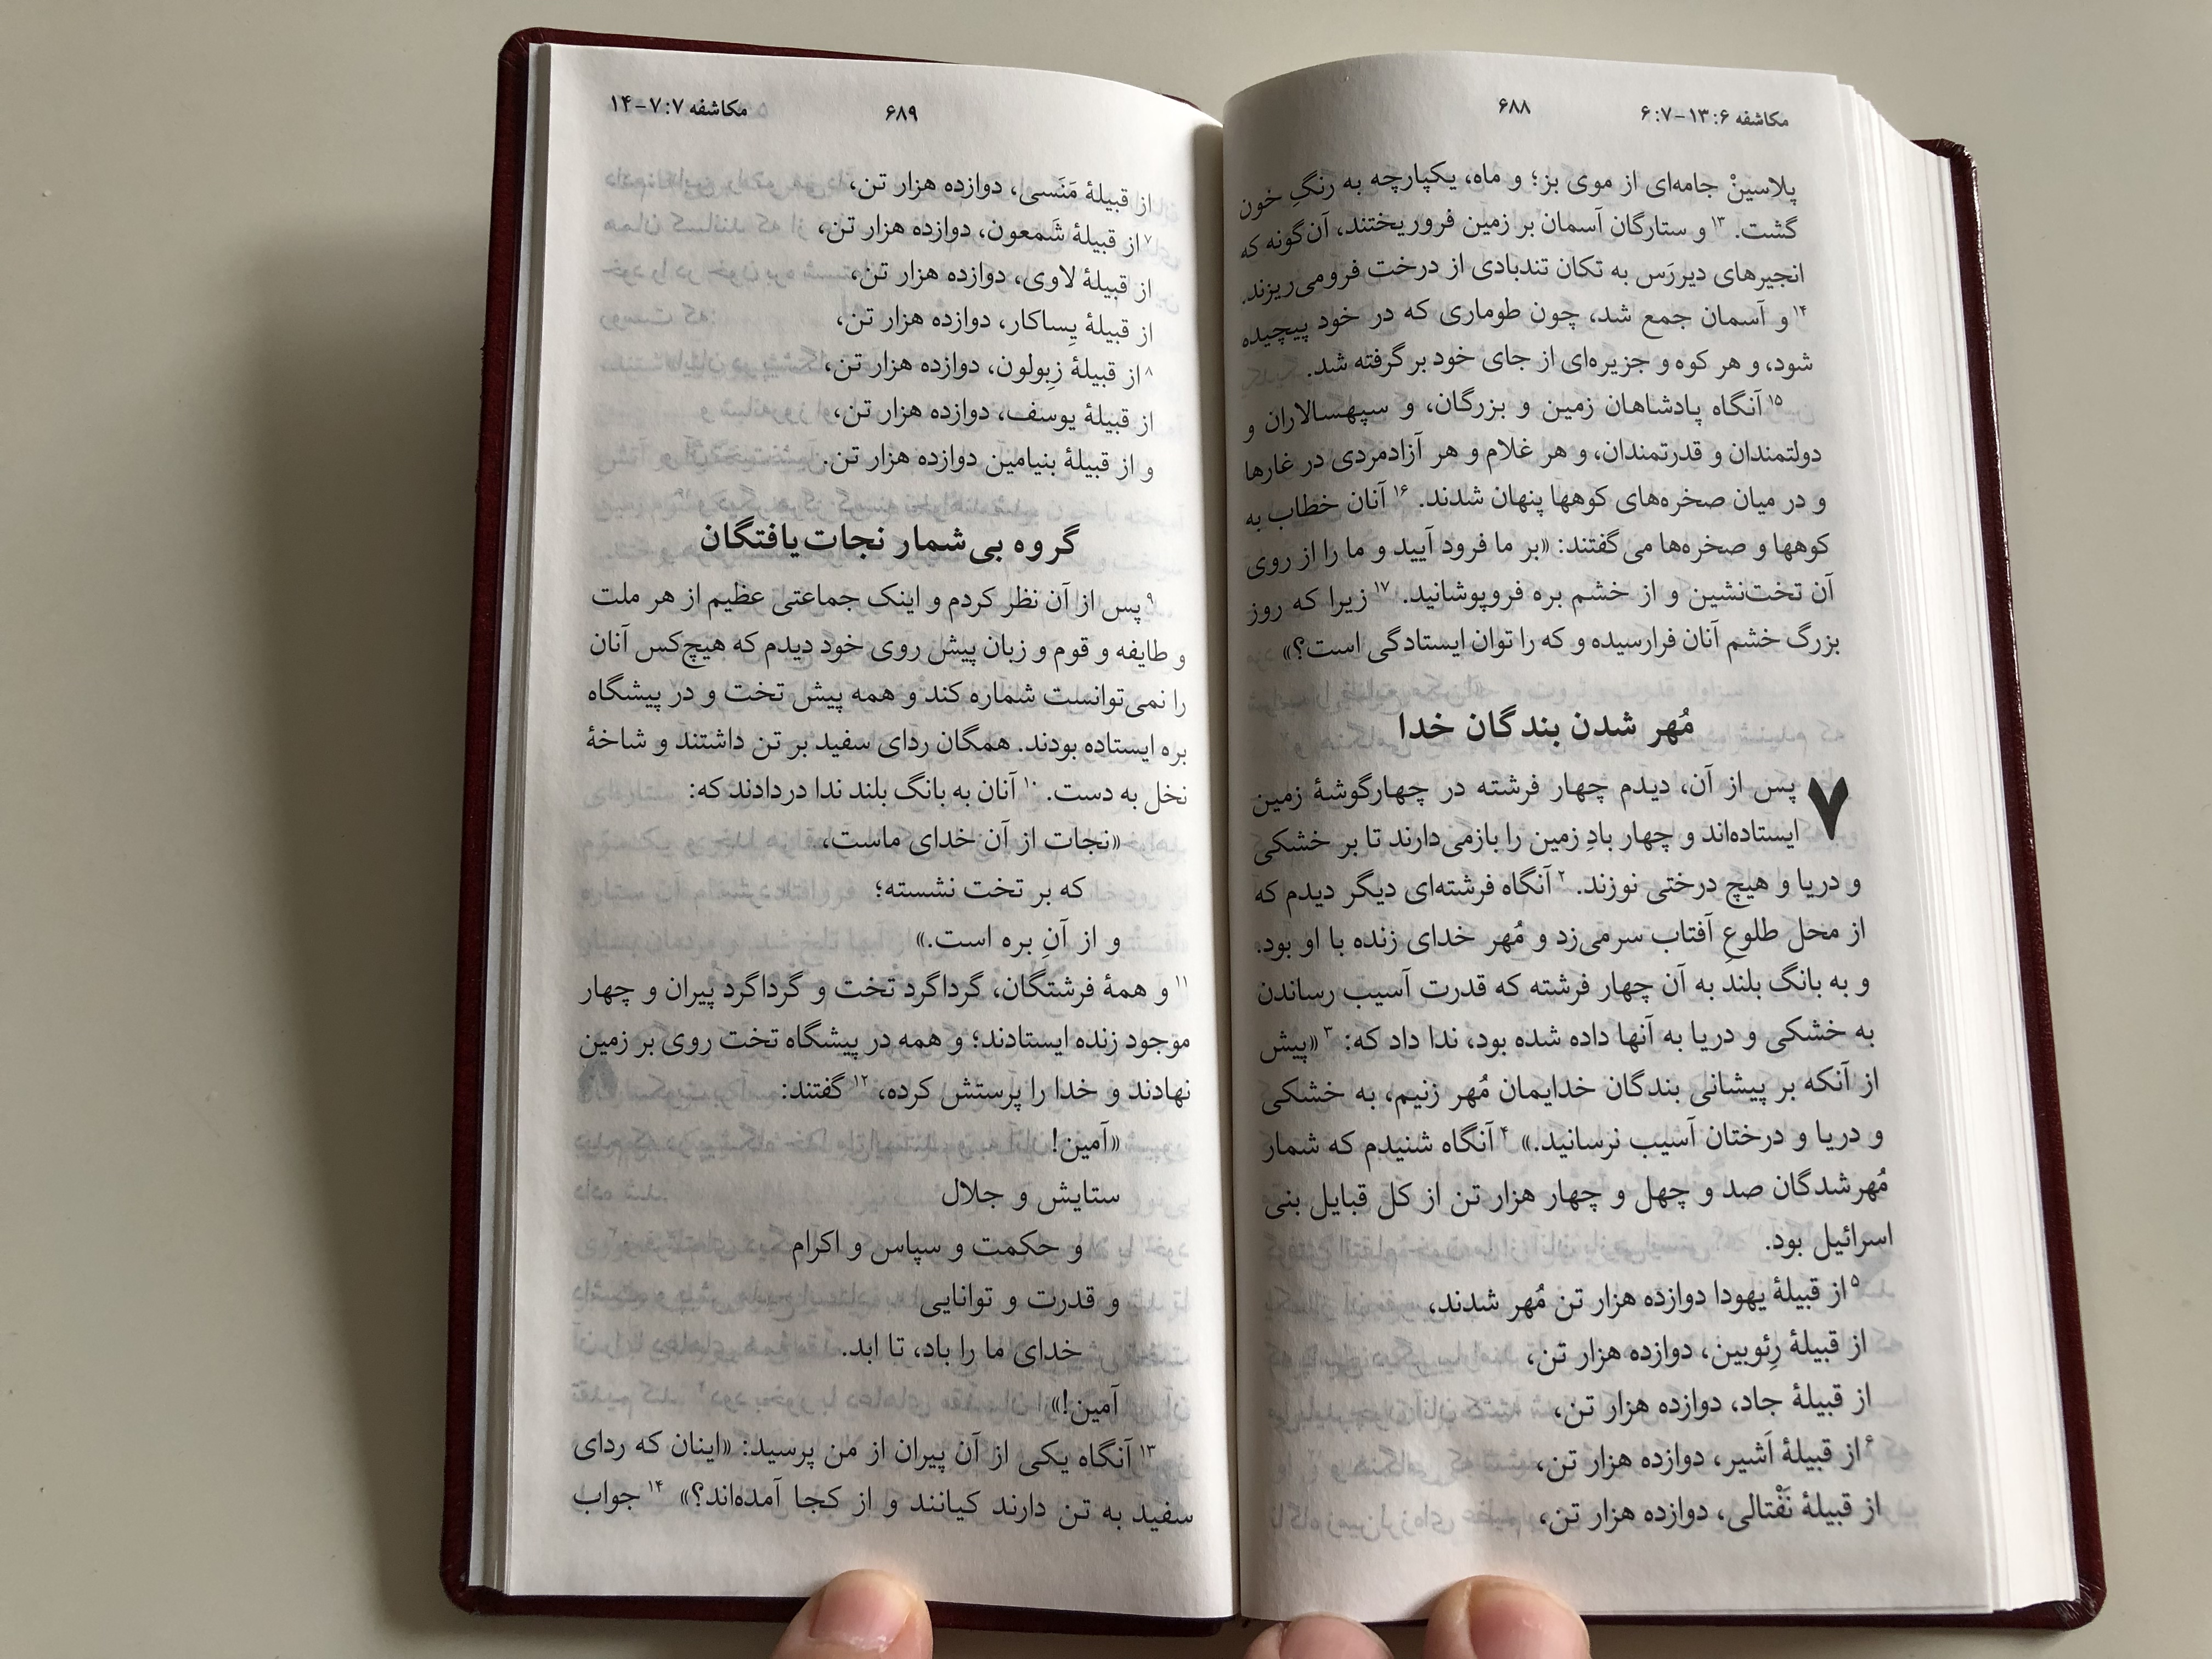 new-testament-in-persian-farsi-language-imitation-leather-bound-pocket-edition-new-millenium-version-elam-ministries-2006-7-.jpg